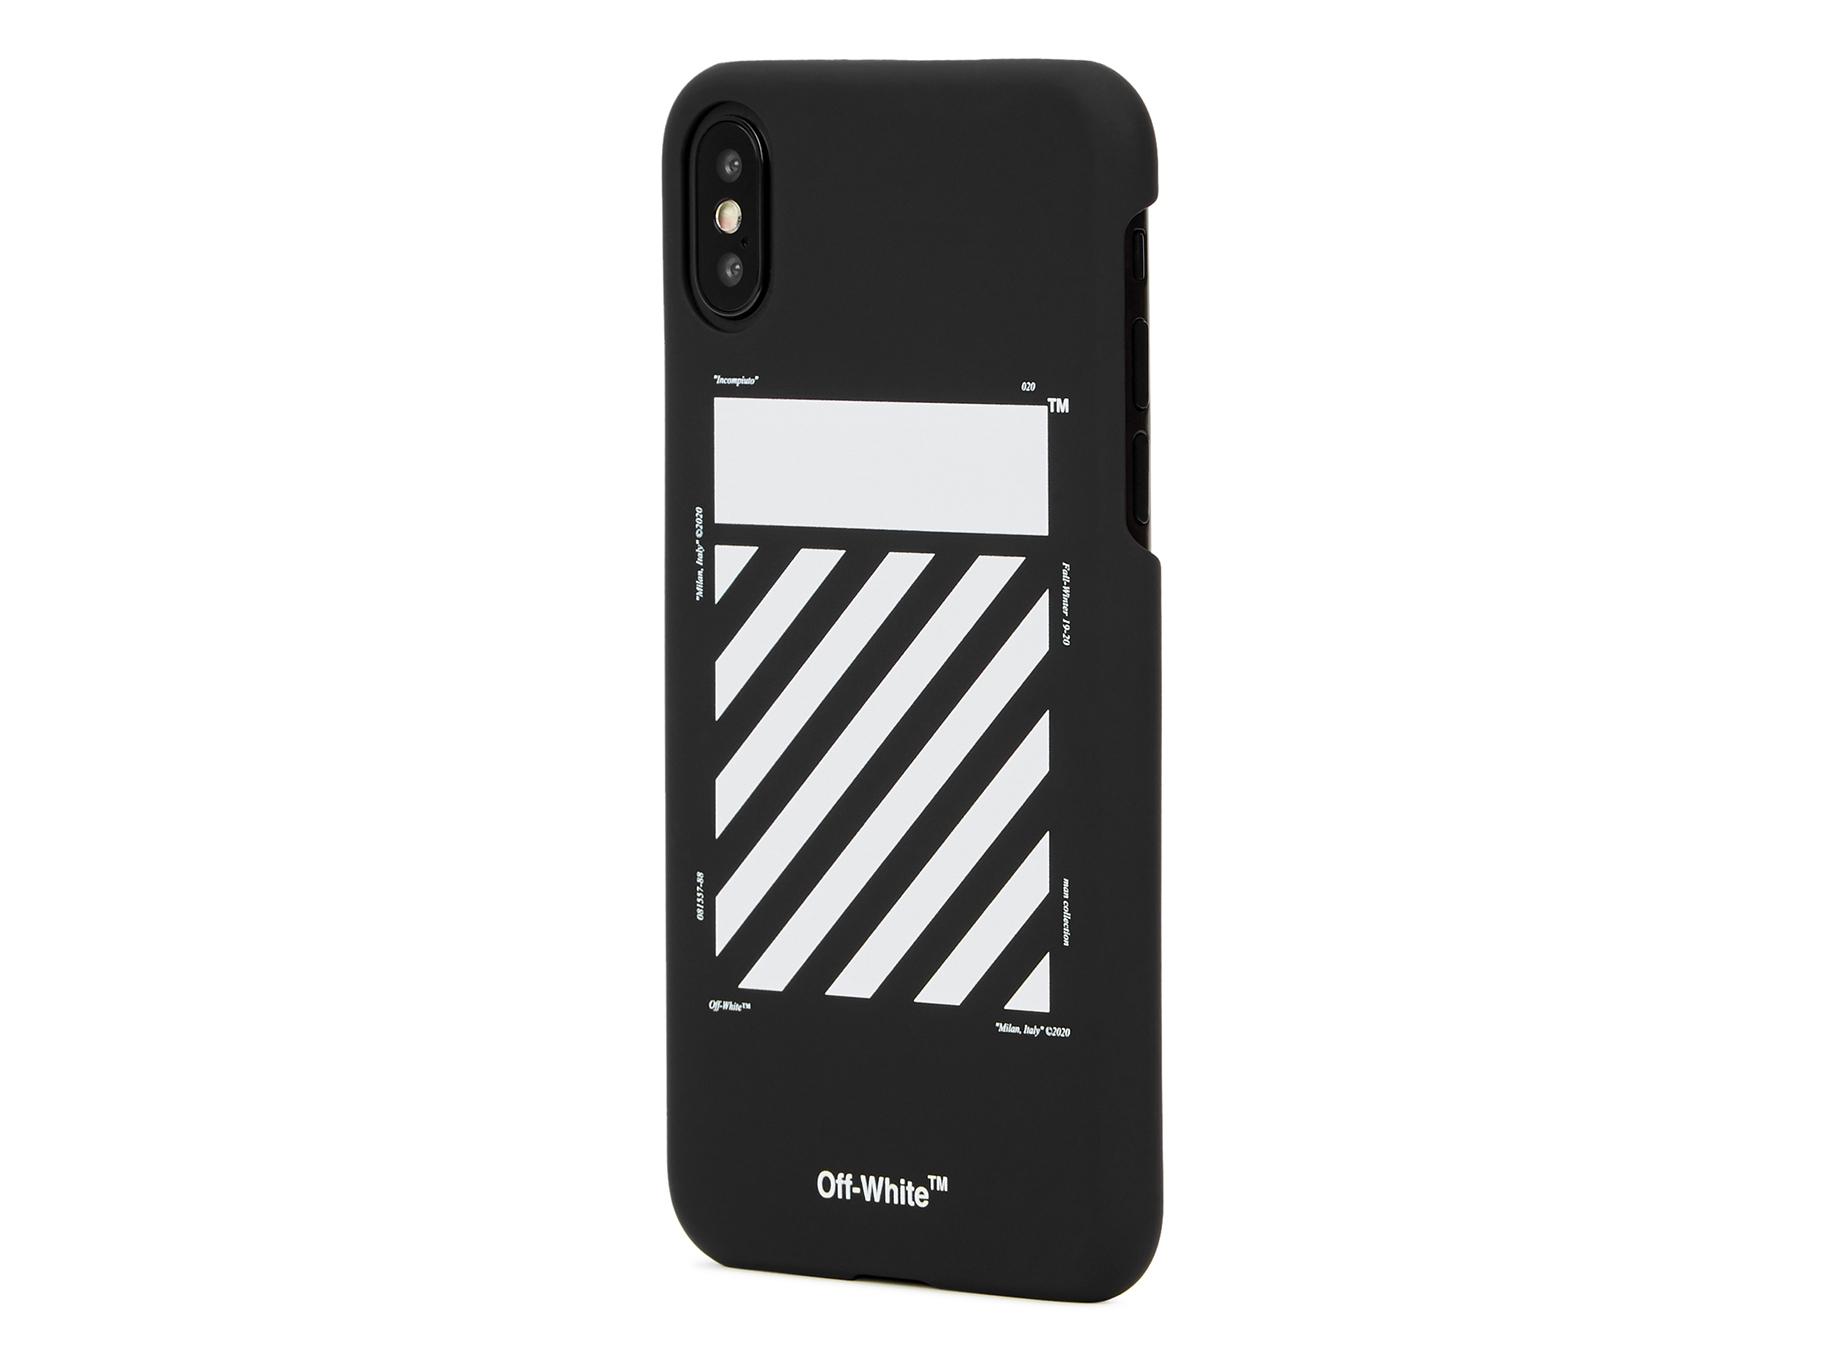 competitive price a133c 6e701 Diag matte black iPhone X case